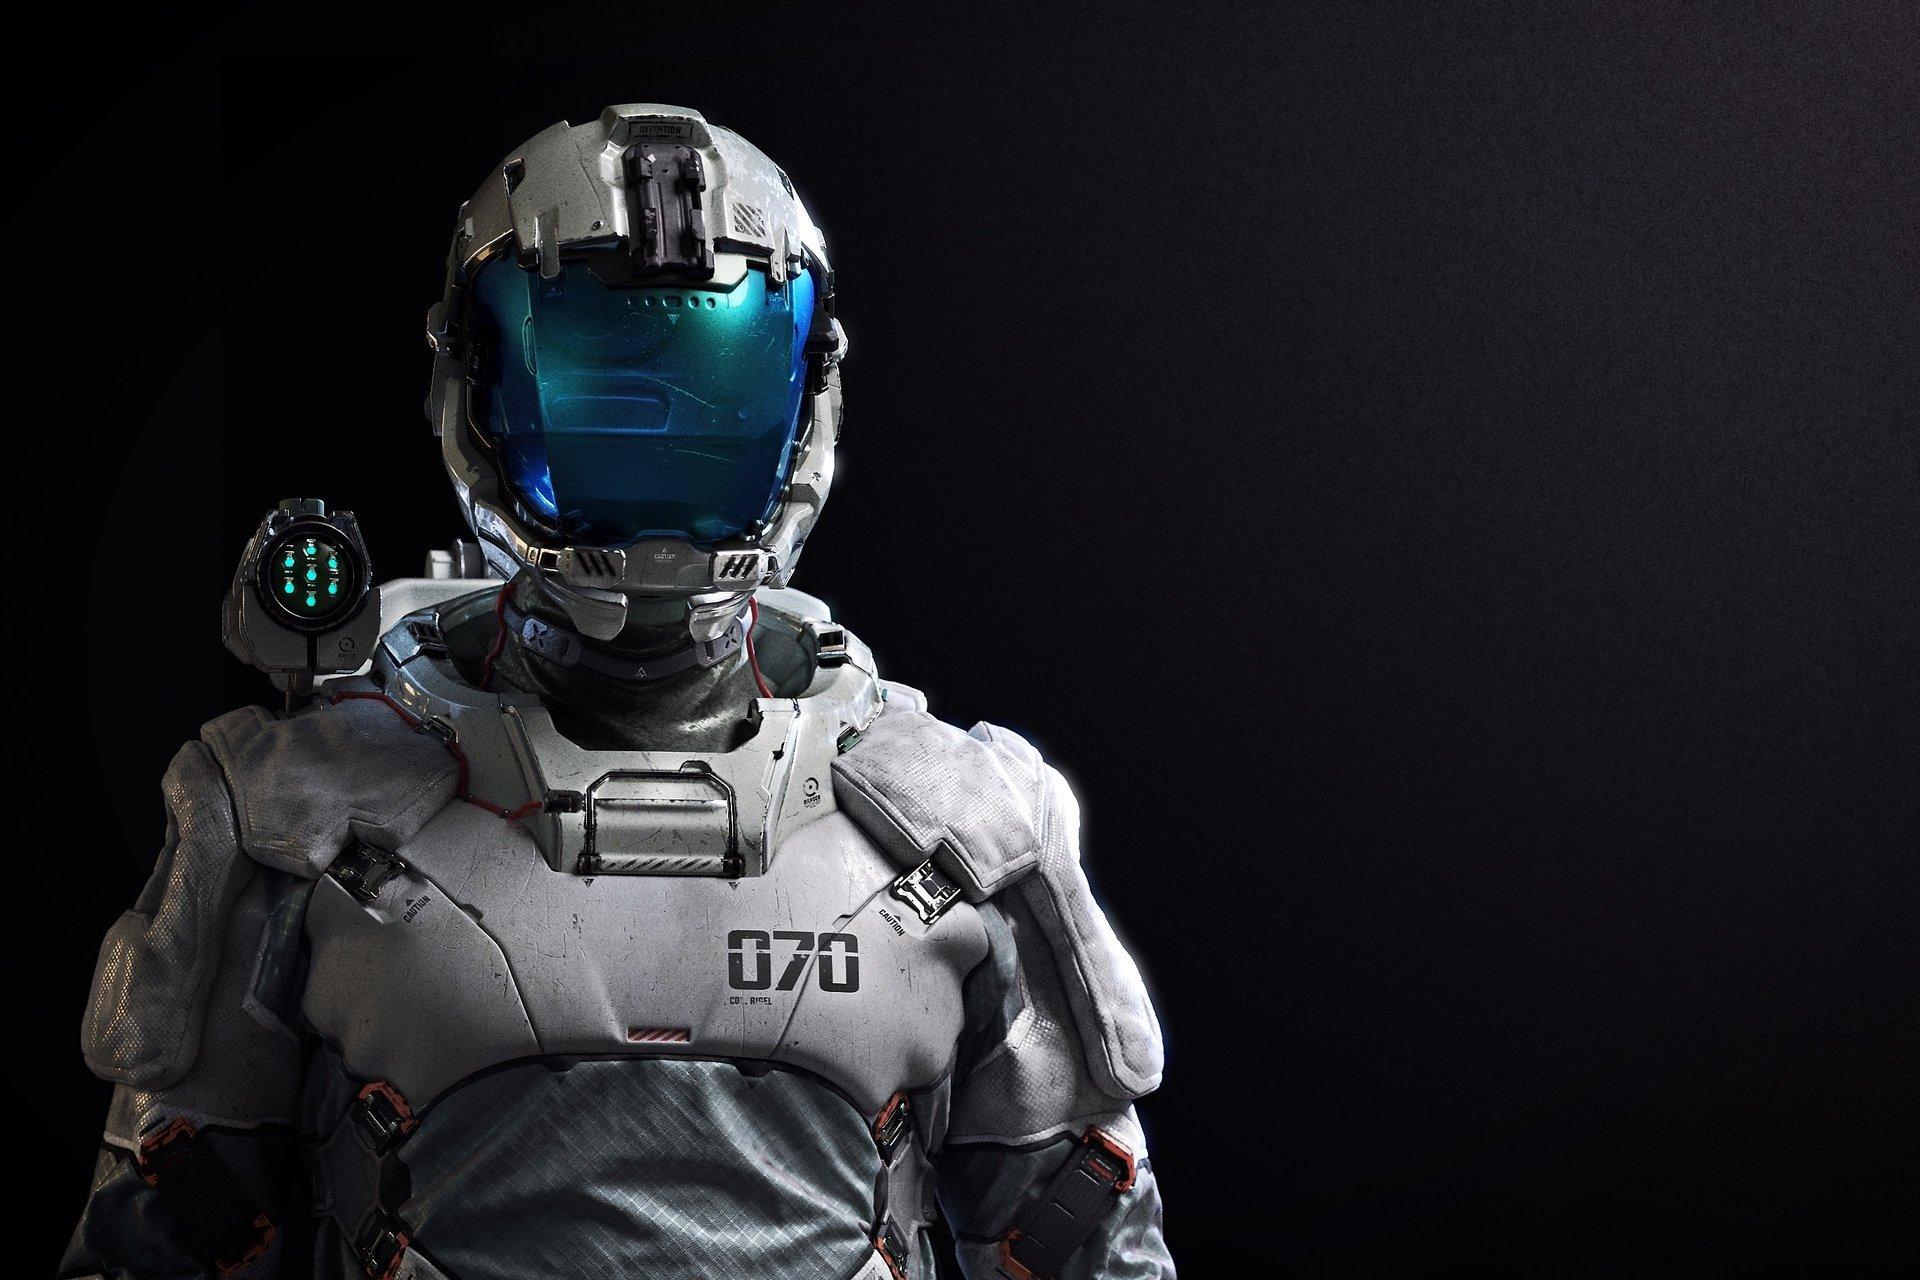 astronaut spaceman - photo #19